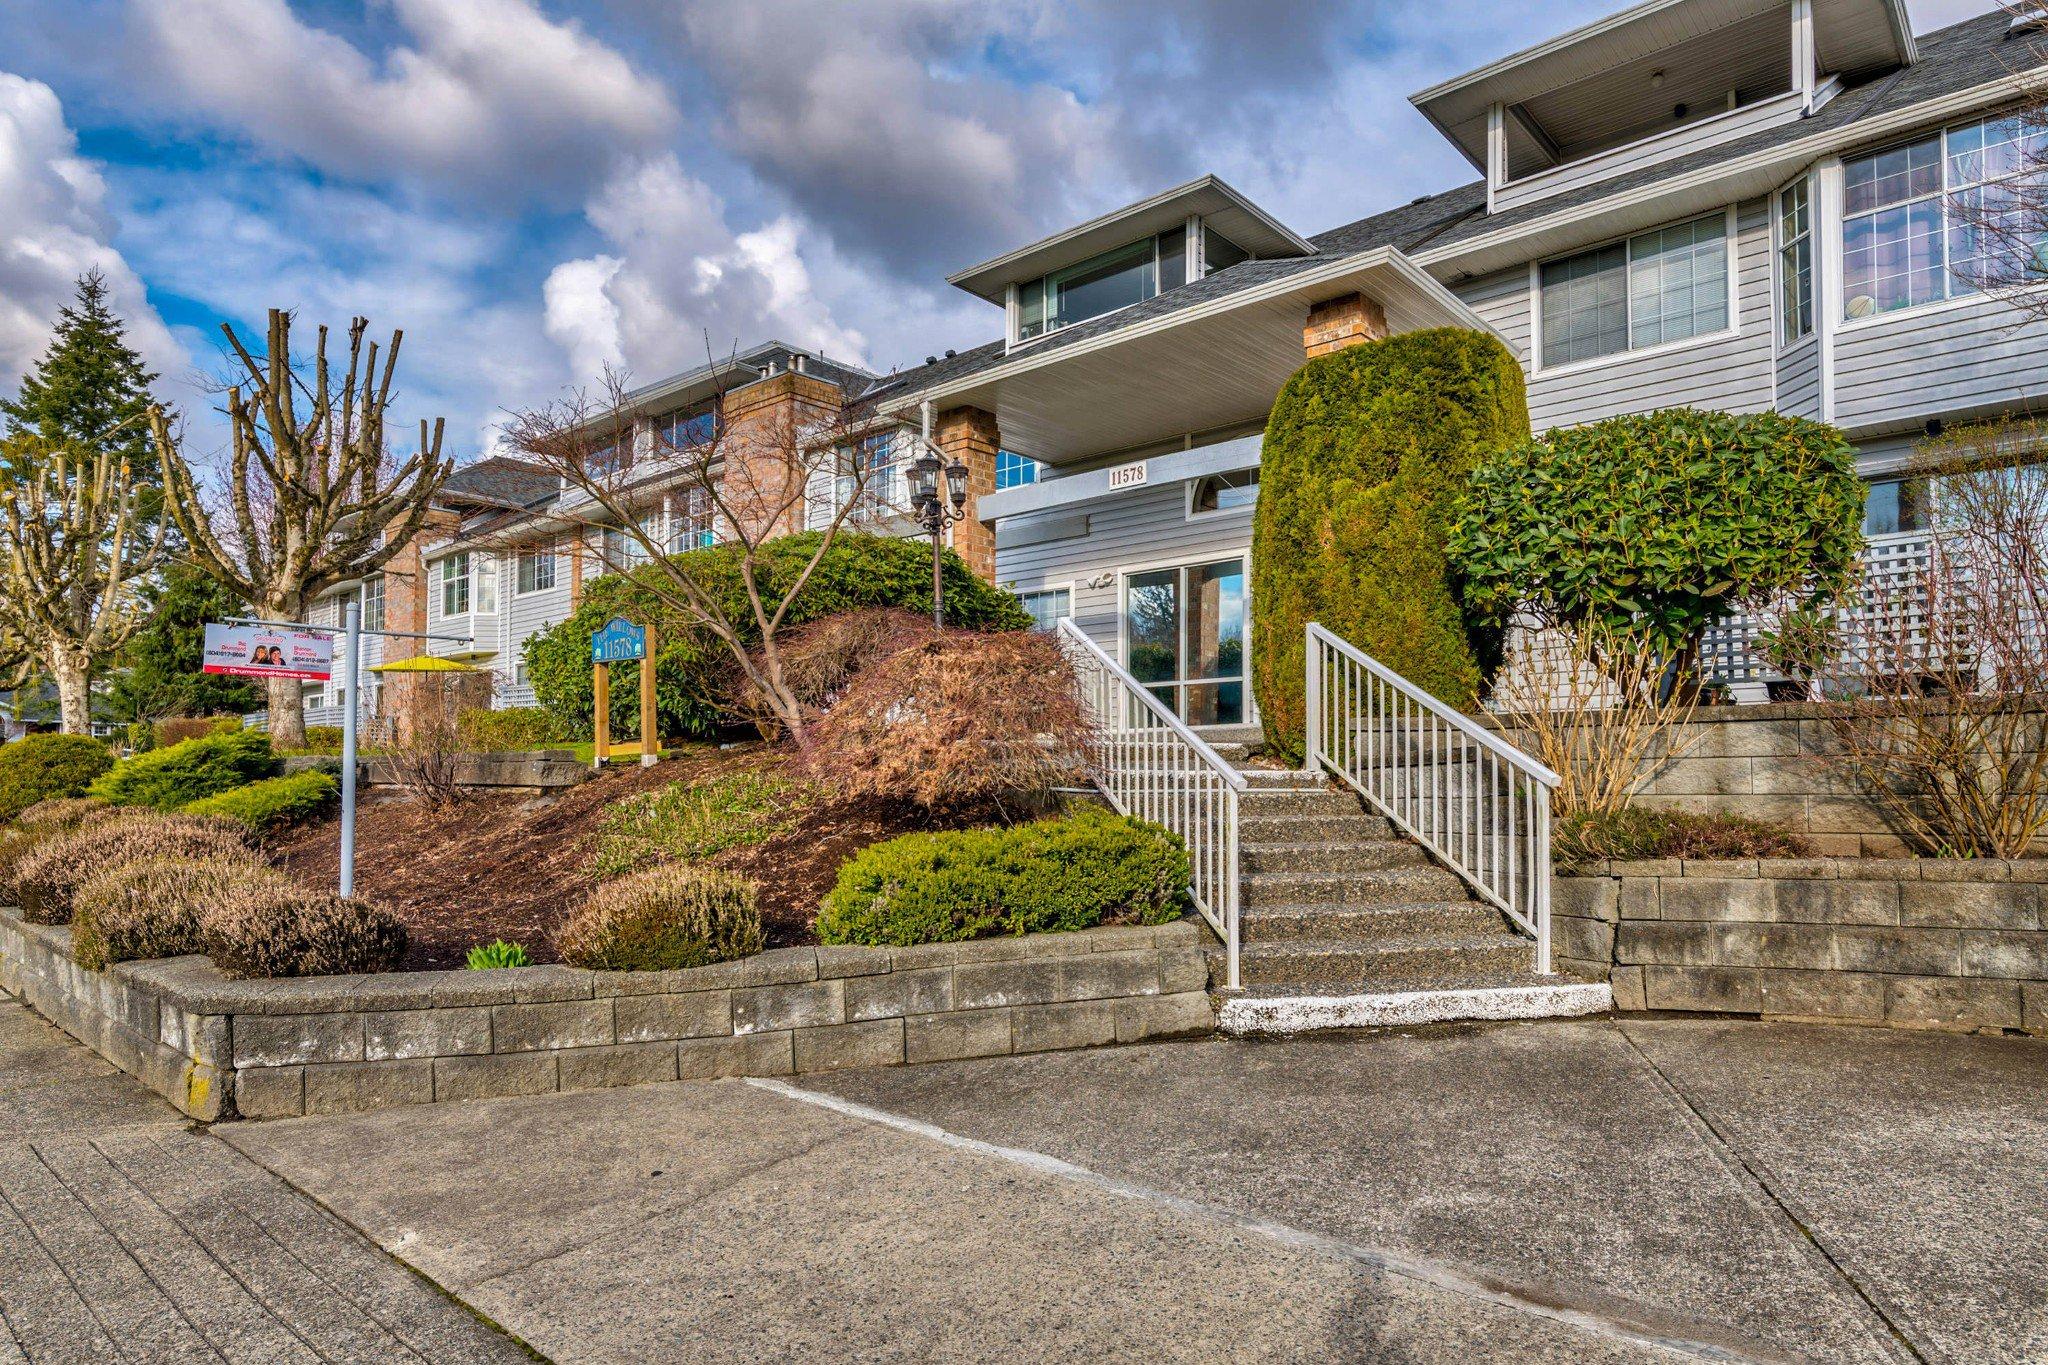 Photo 4: Photos: 203 11578 225 STREET in Maple Ridge: Condo for sale : MLS®# R2447700